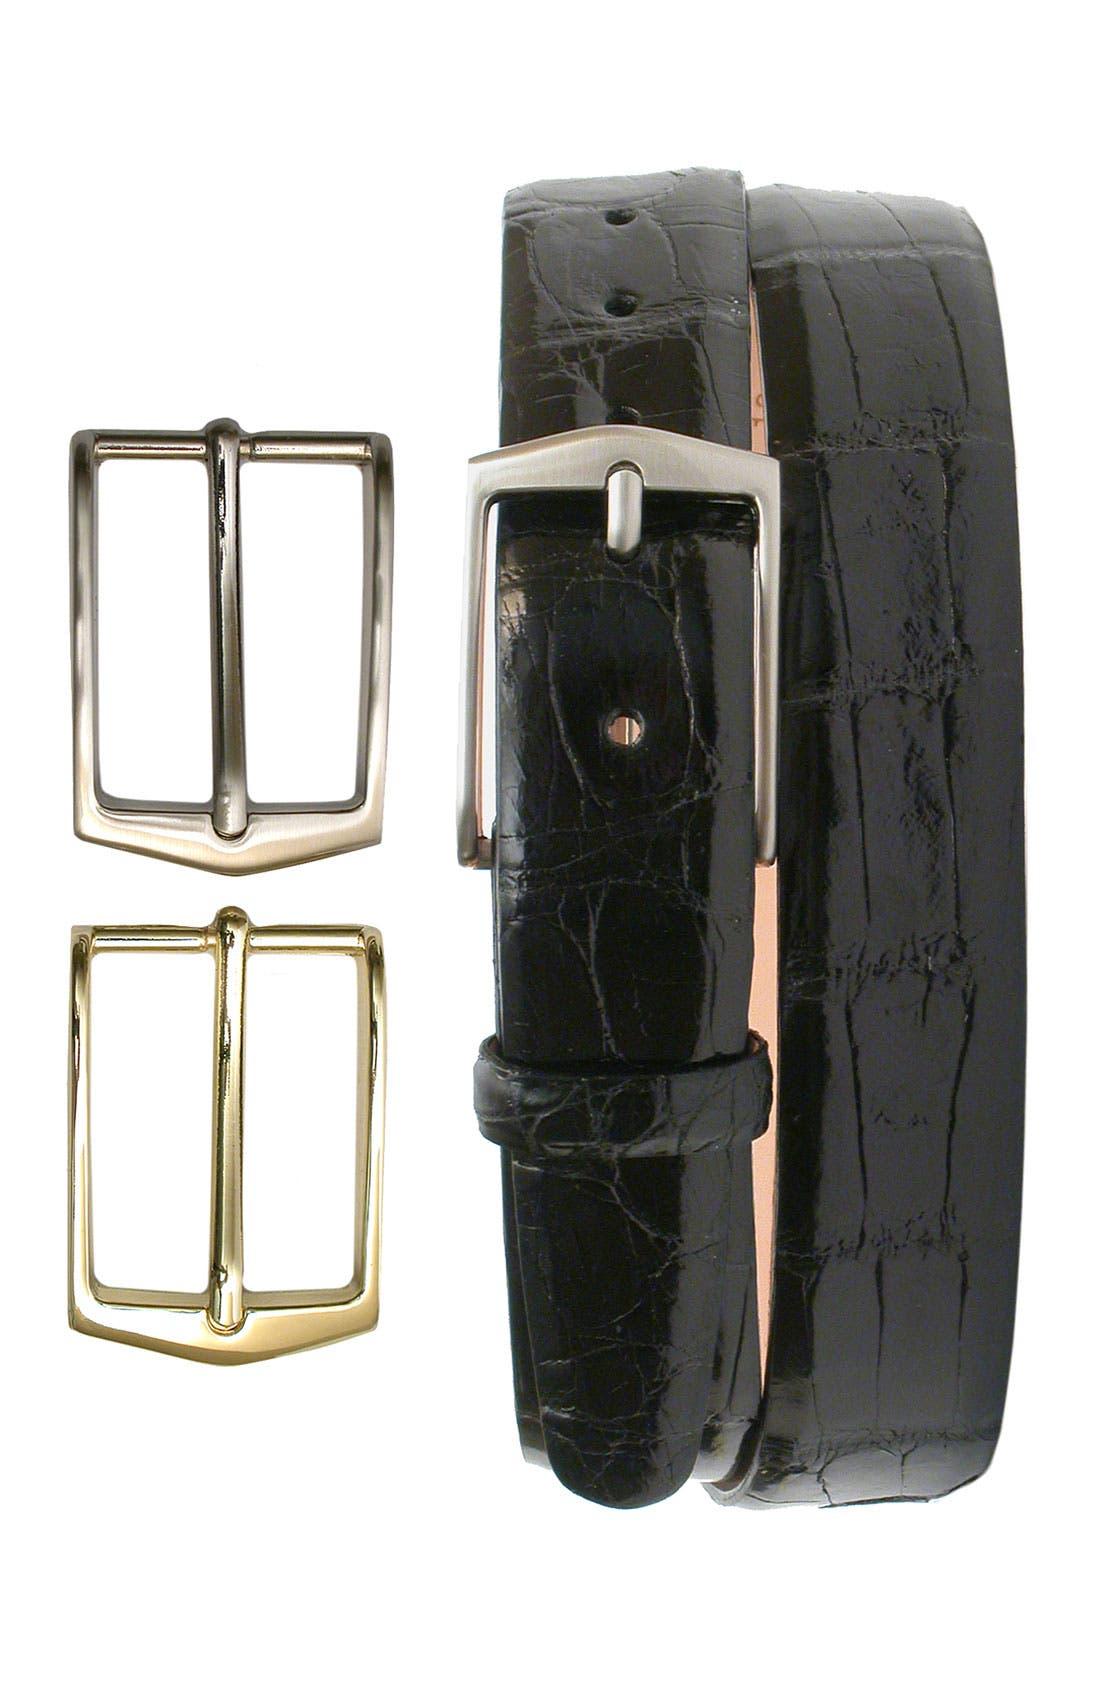 Alternate Image 1 Selected - Martin Dingman 'Julian' Glazed American Alligator Leather Belt with Interchangeable Buckles